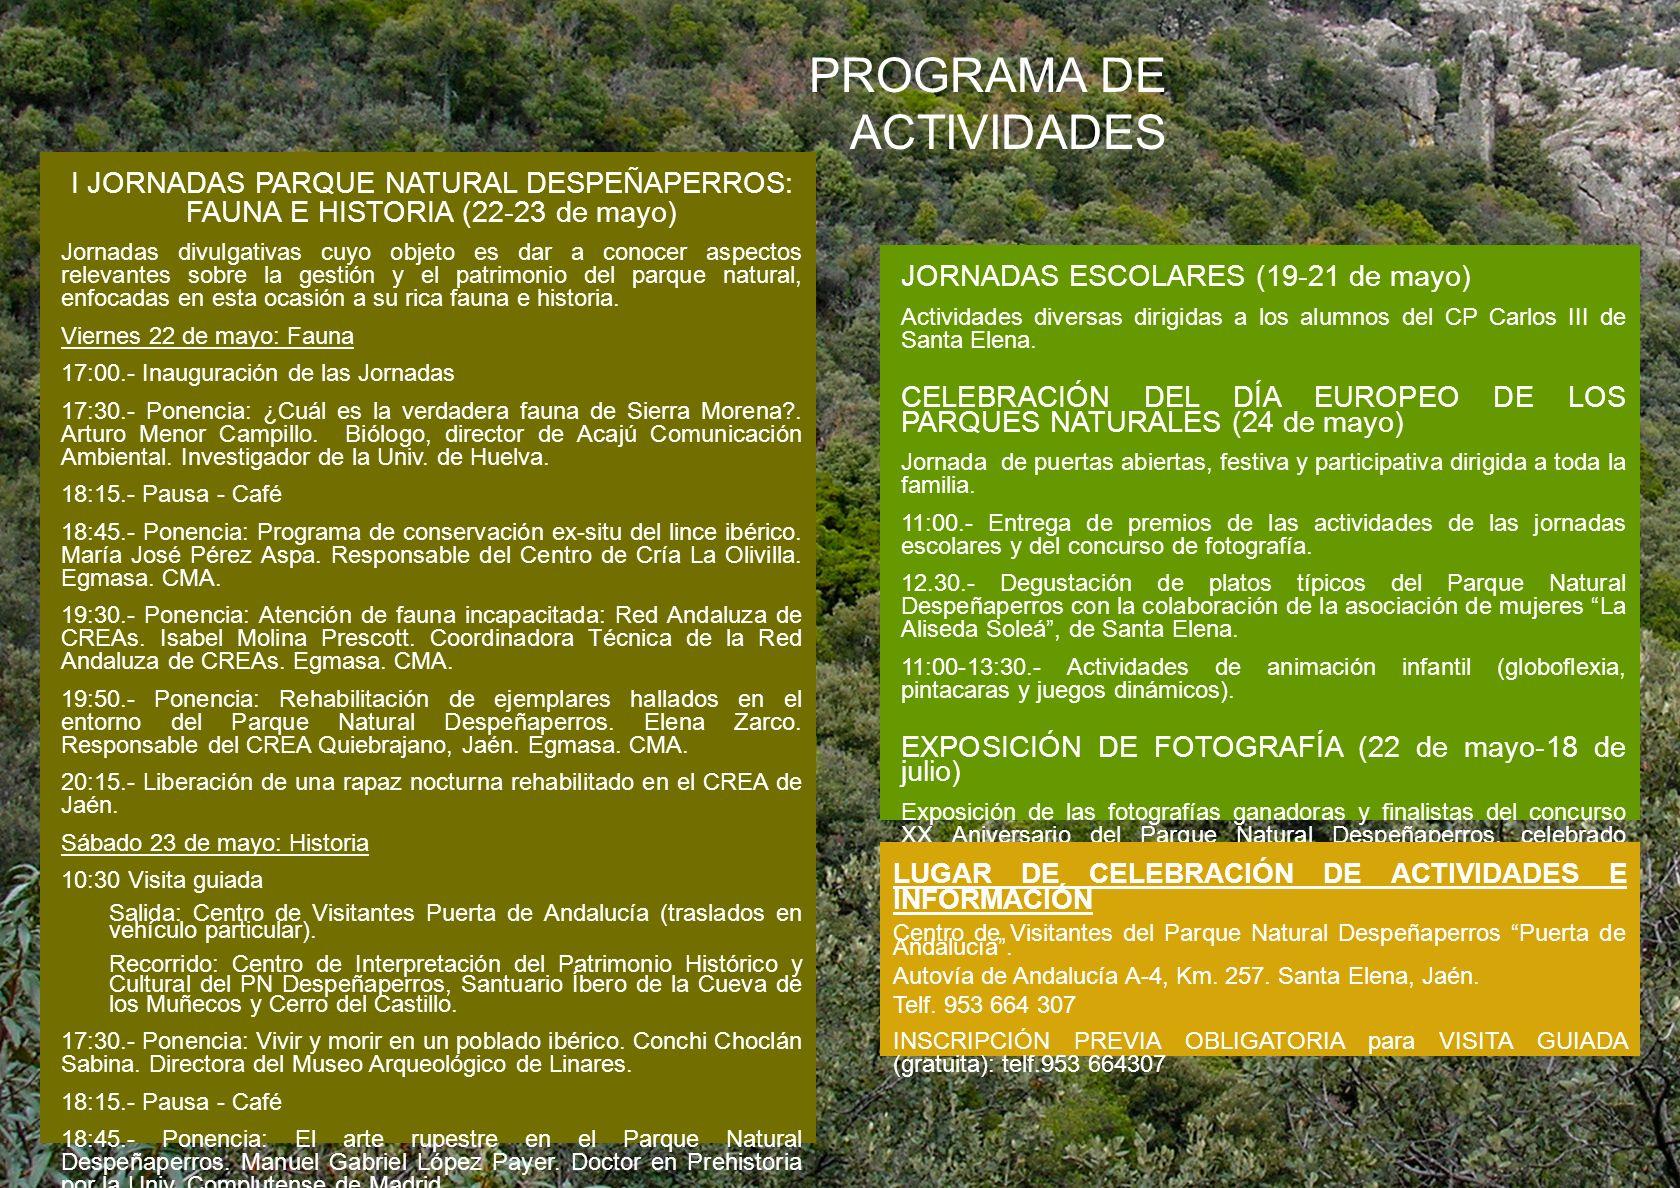 PROGRAMA DE ACTIVIDADES I JORNADAS PARQUE NATURAL DESPEÑAPERROS: FAUNA E HISTORIA (22-23 de mayo) Jornadas divulgativas cuyo objeto es dar a conocer a